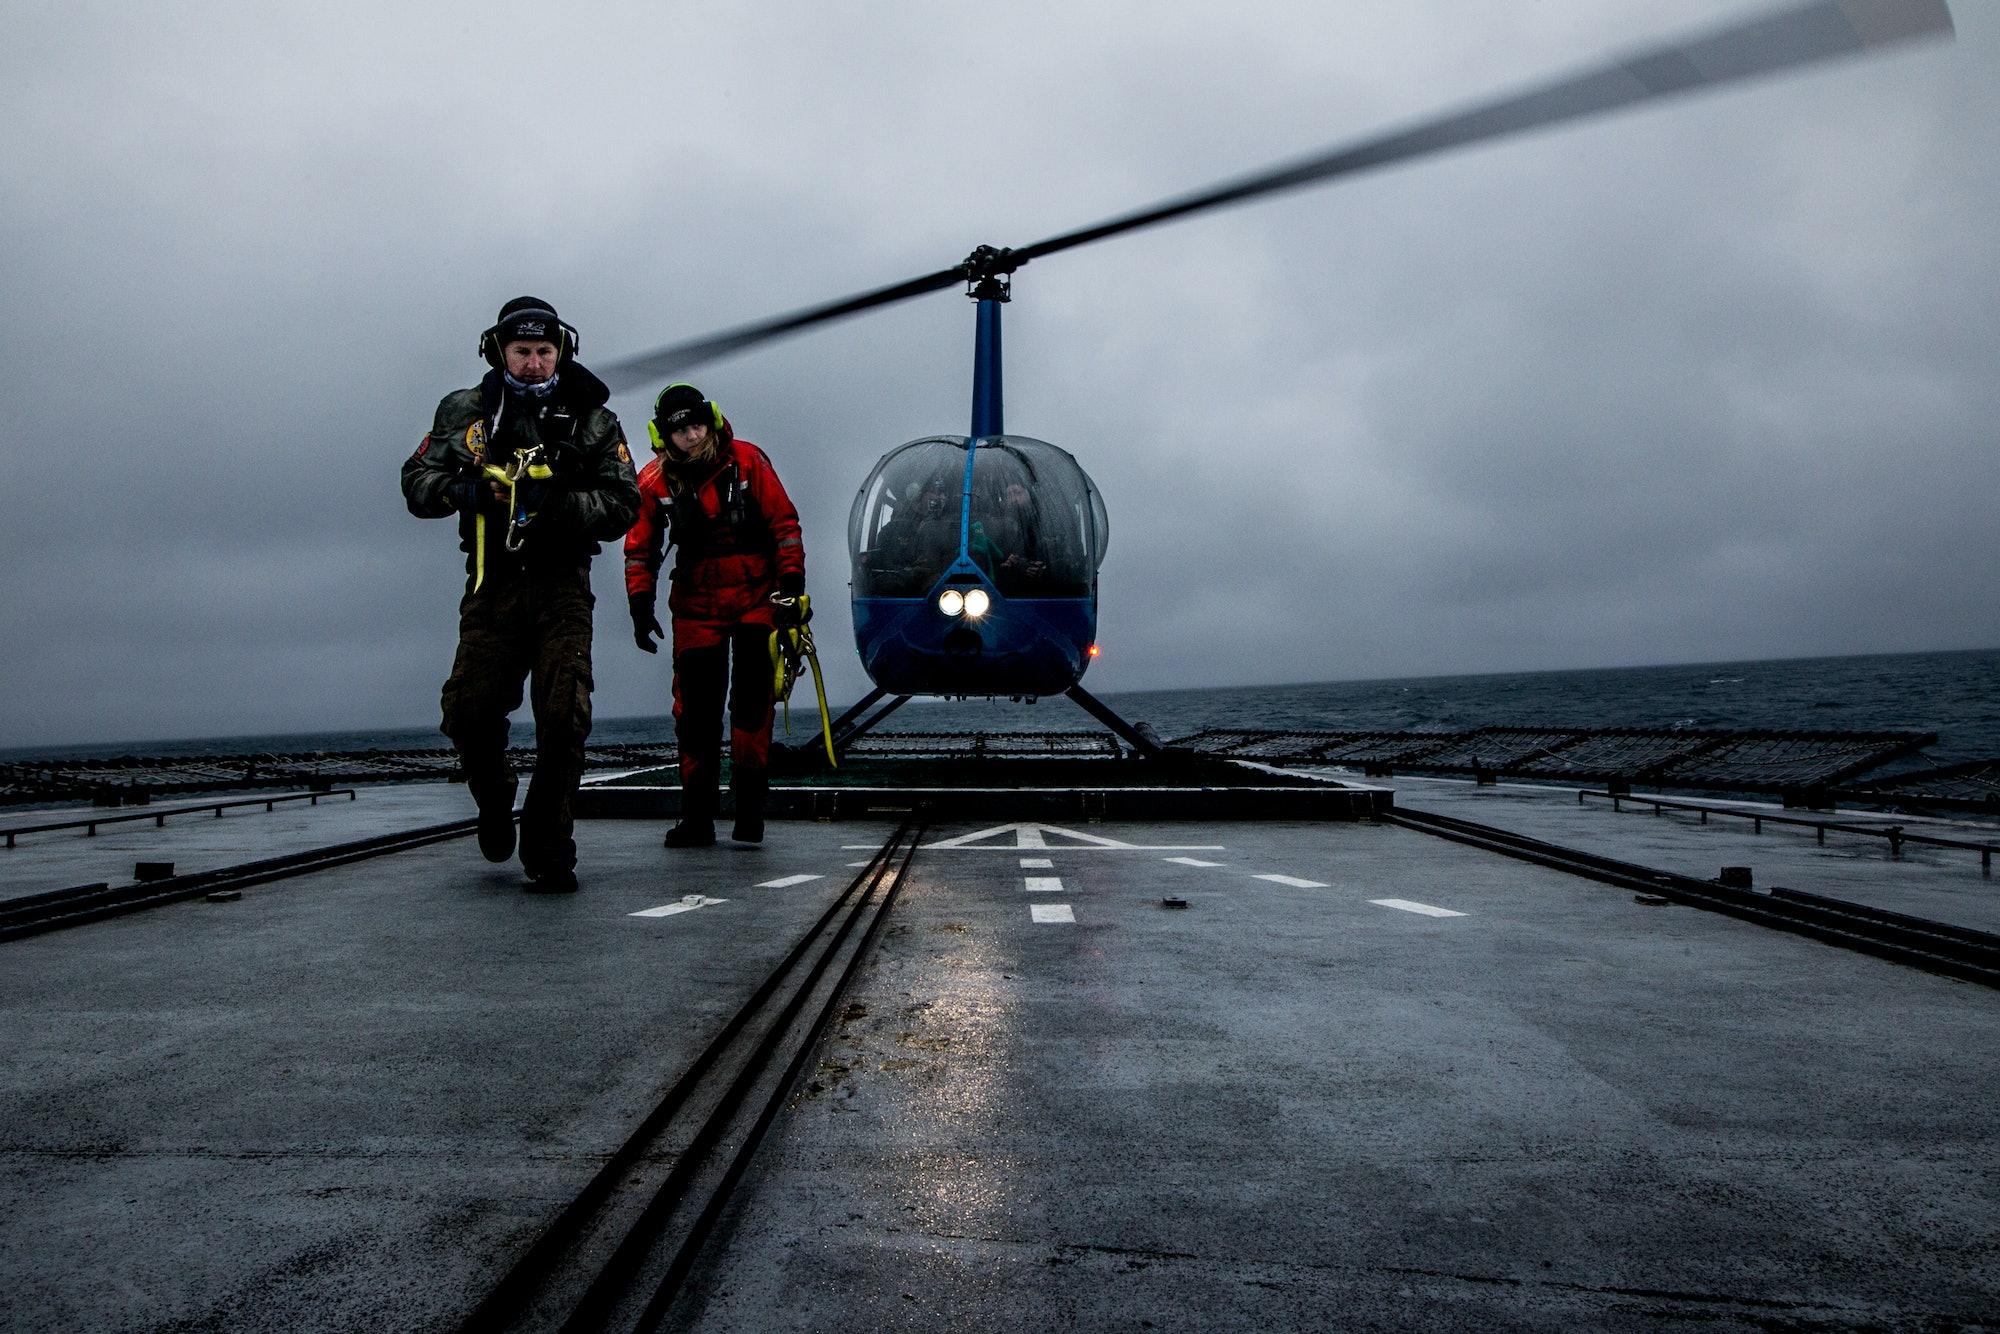 sea shepherd helicopter antarctica japanese whalers nemesis